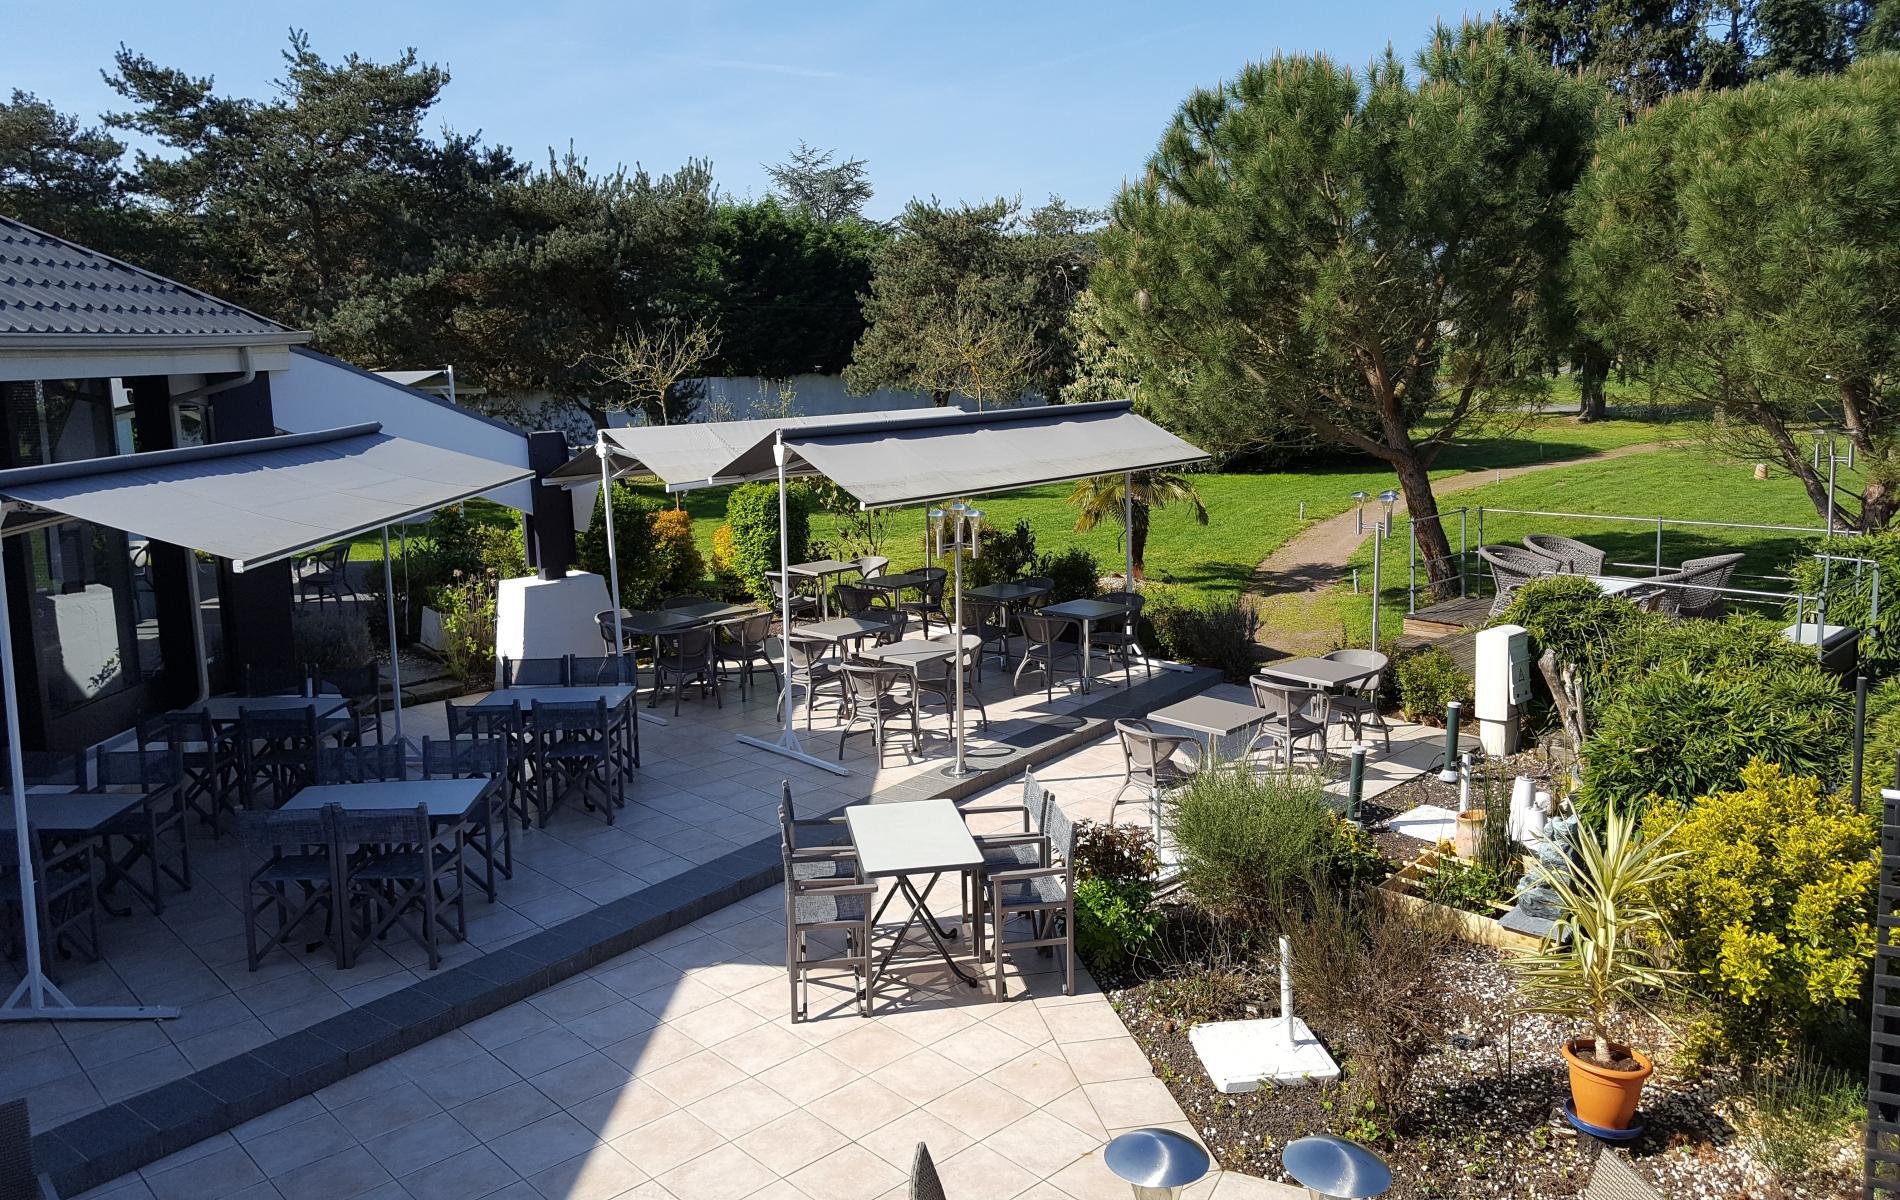 ∞ Logis Hotel proche Montlu§on en Auvergne Le Jardin Délice